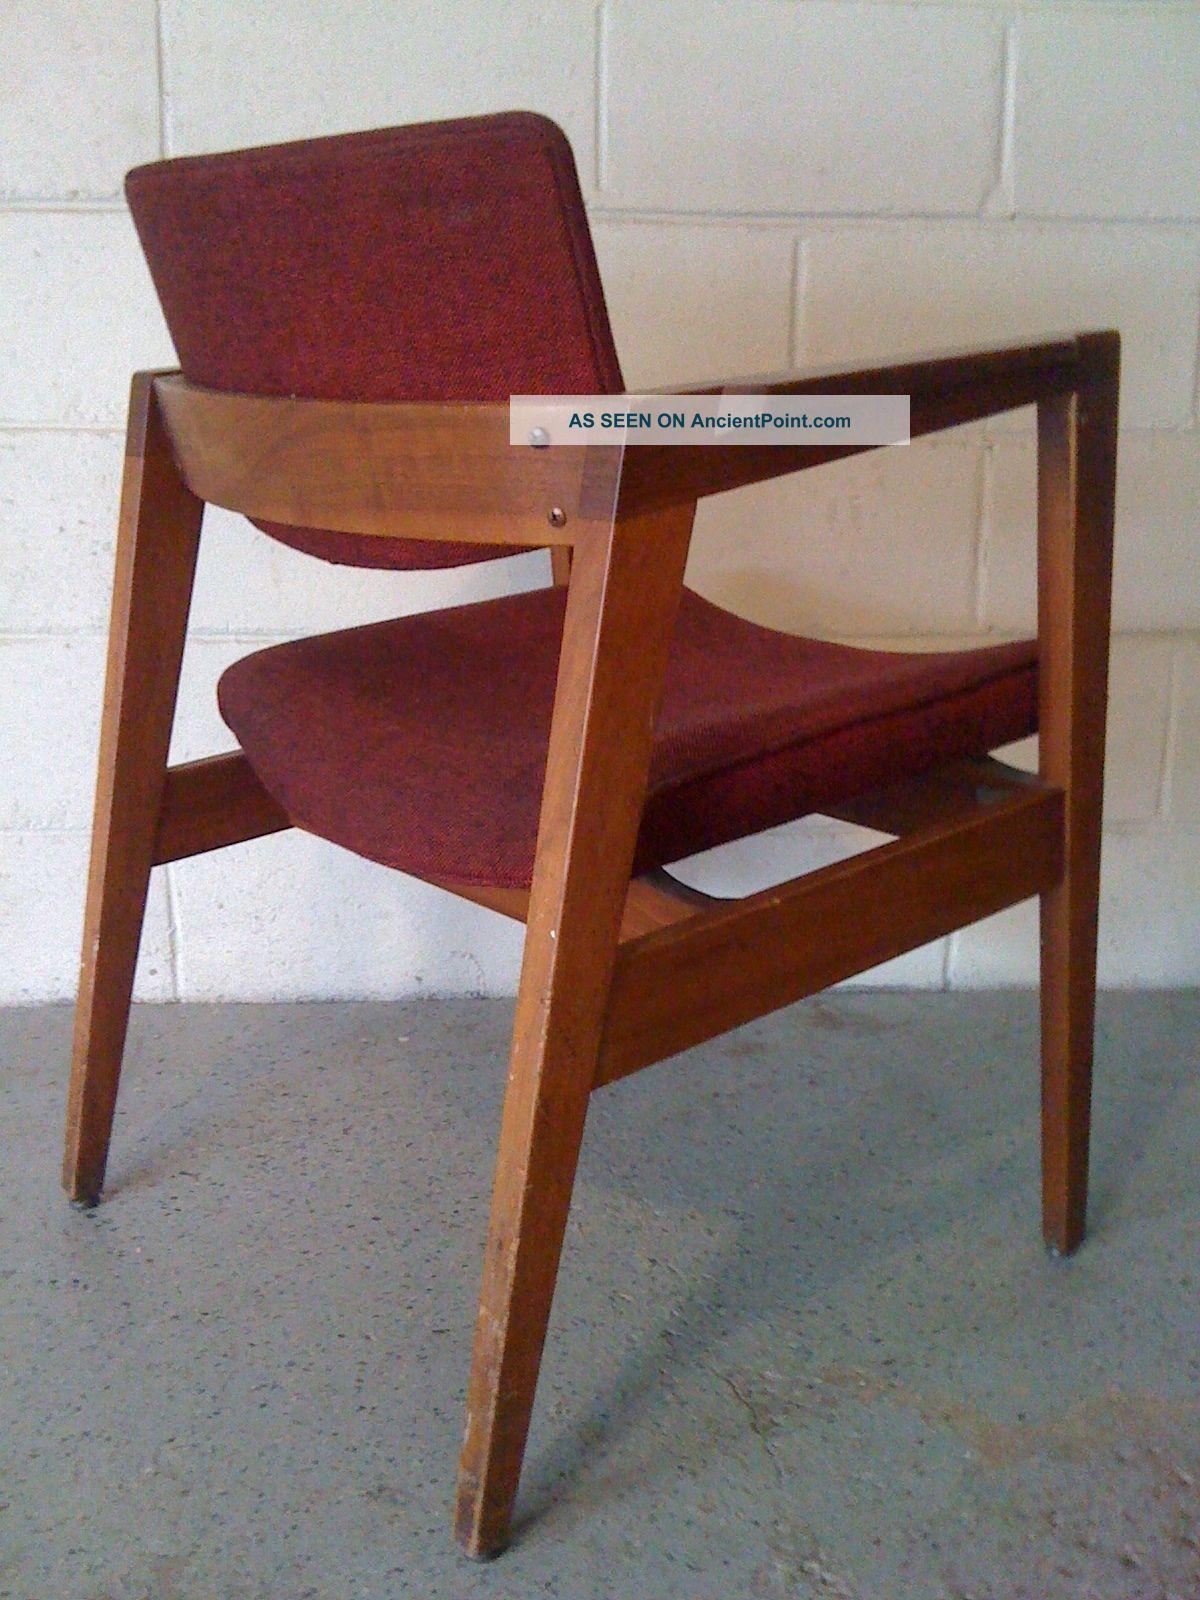 Rut Ro Vintage Gunlocke Danish Modern Armchair W/burgundy Upholstery 1900-1950 photo